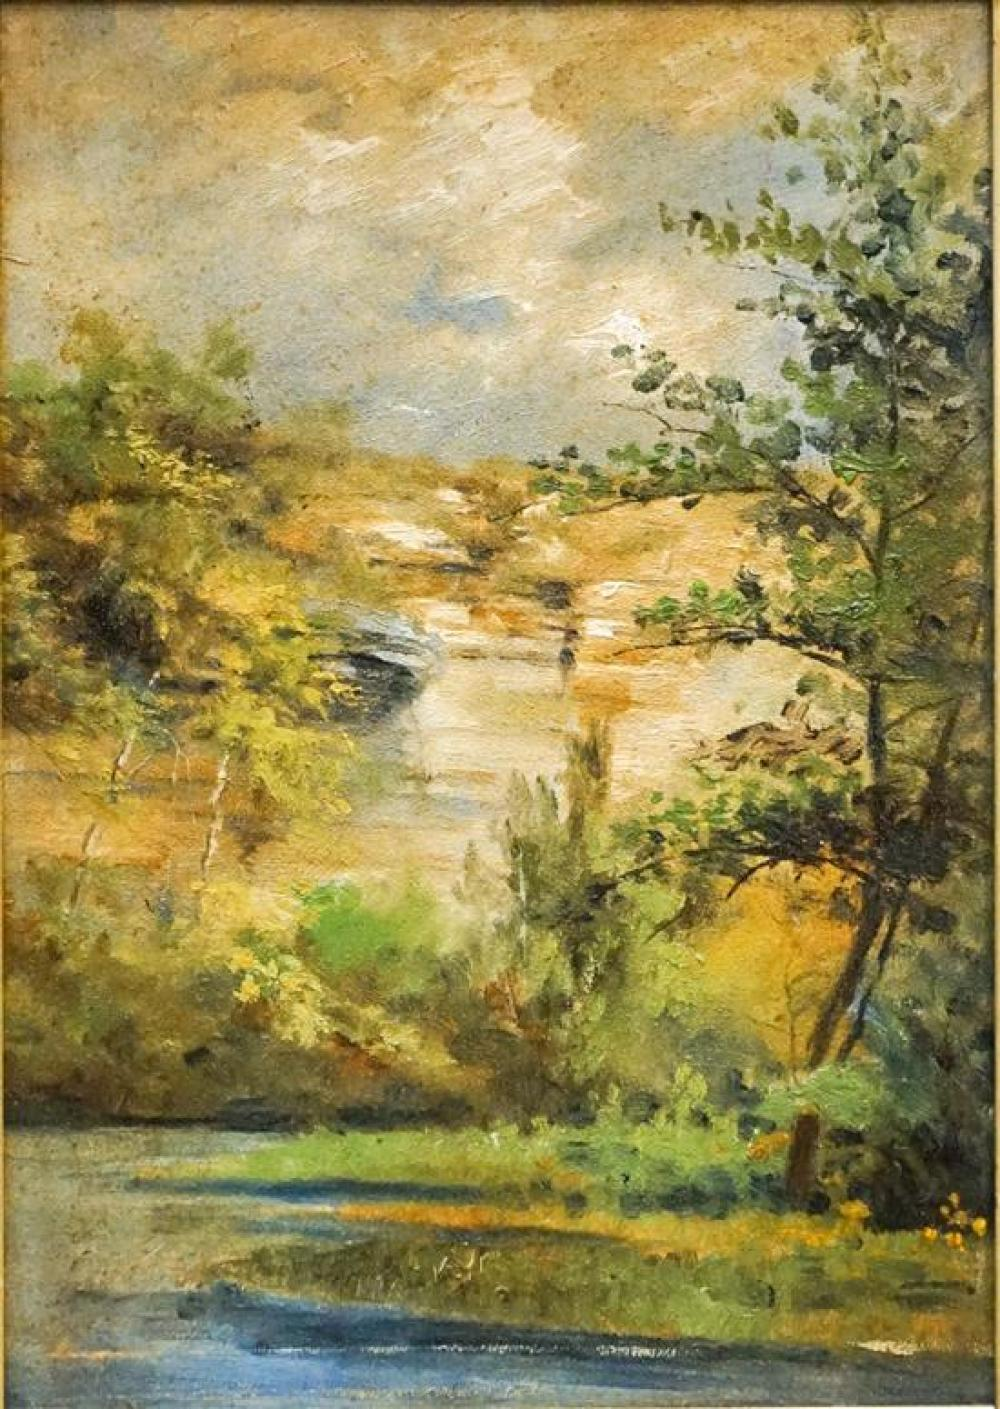 Laura A Gleason (American 1856-1934), California Landscape, Oil on Panel, Frame: 13-1/2 x 10-1/2 in